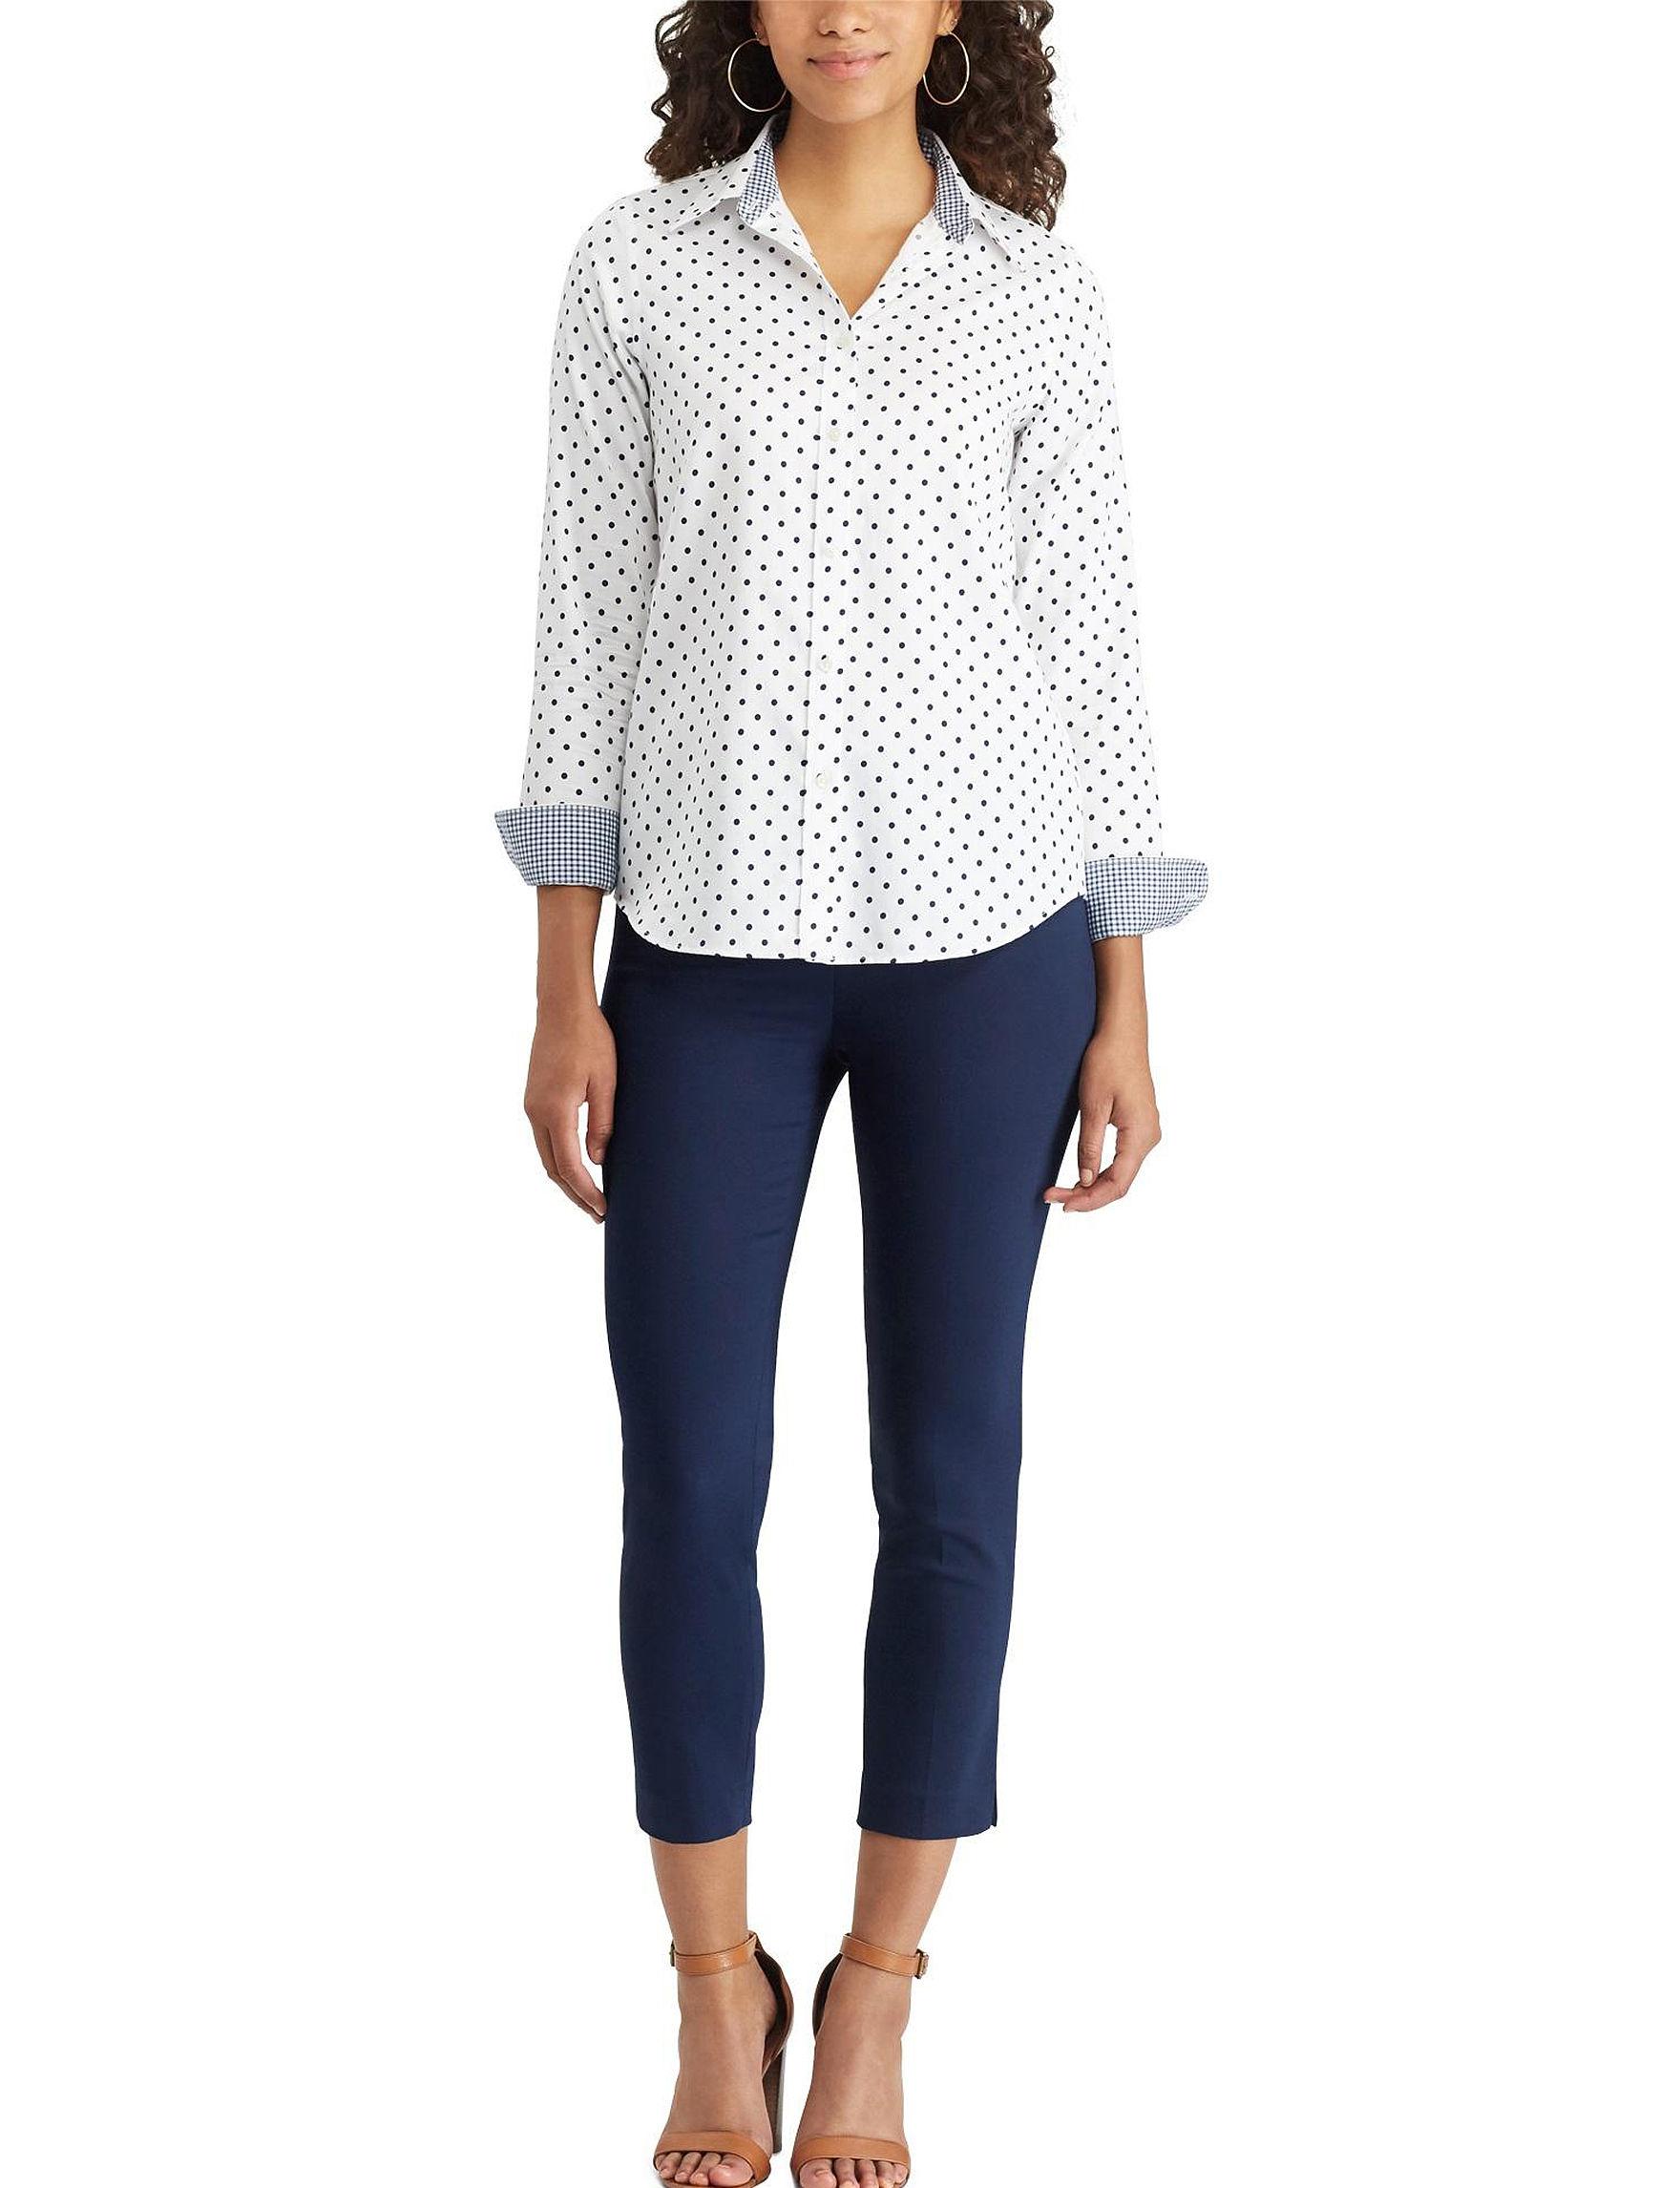 Chaps White / Blue Shirts & Blouses